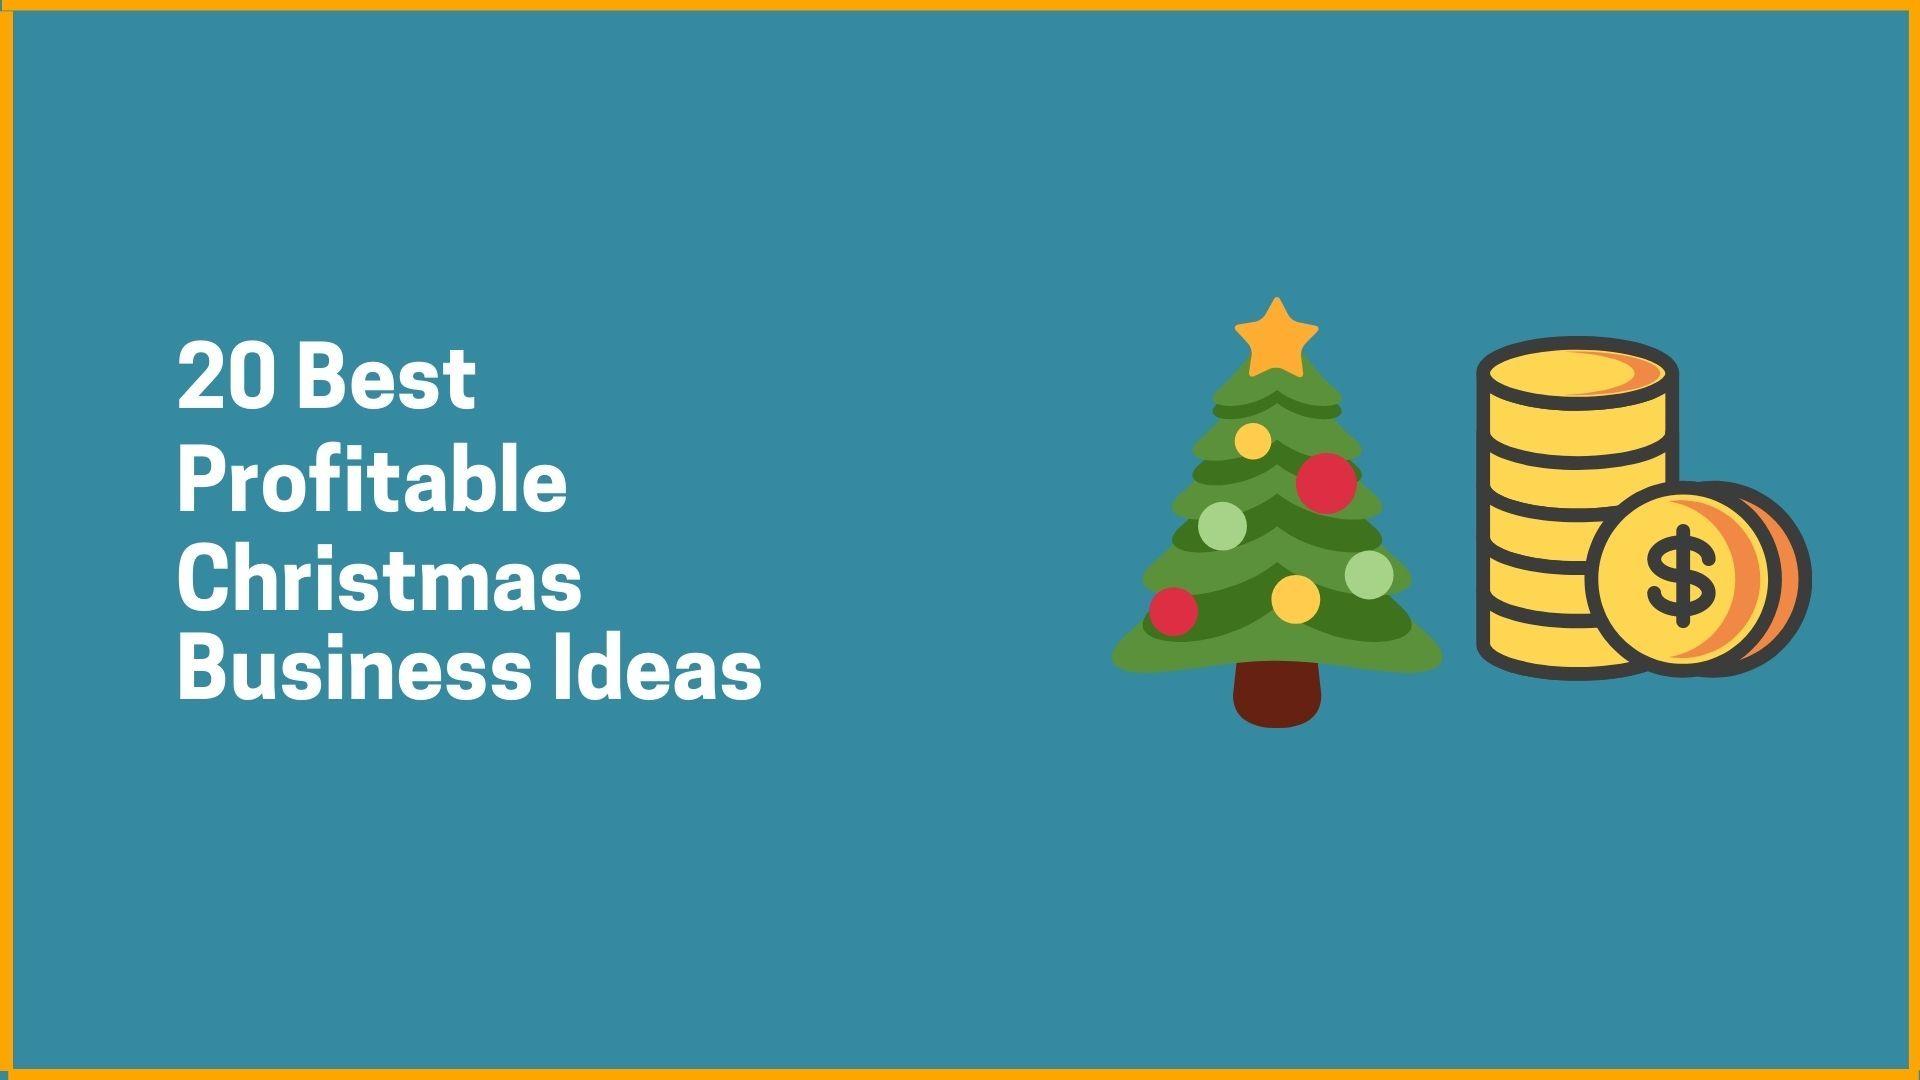 20 Best Profitable Christmas Business Ideas